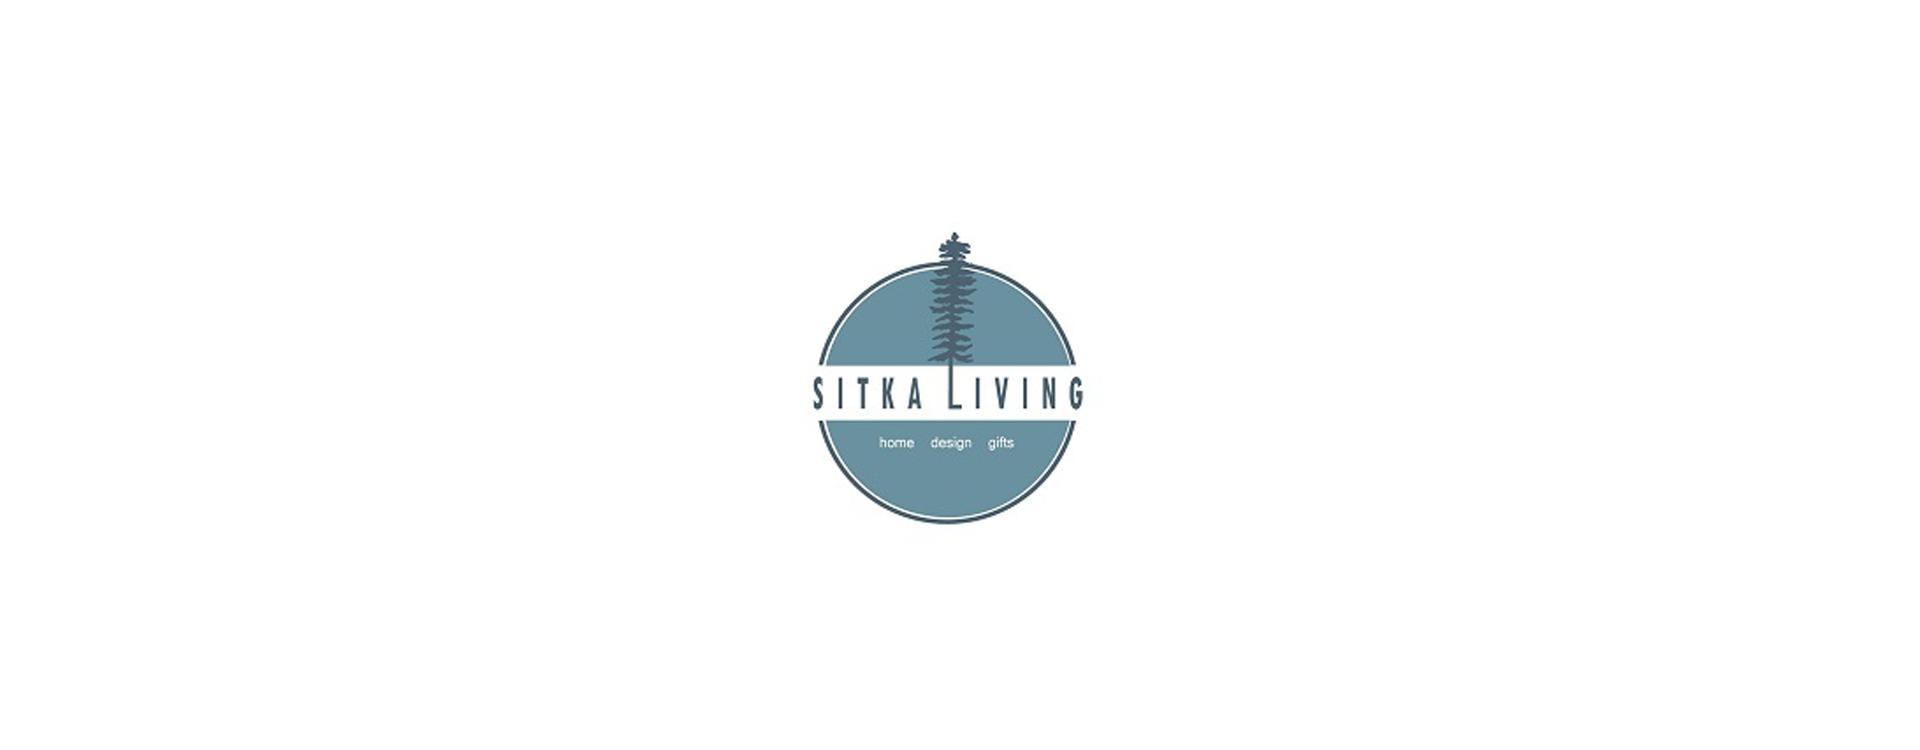 Sitka Living